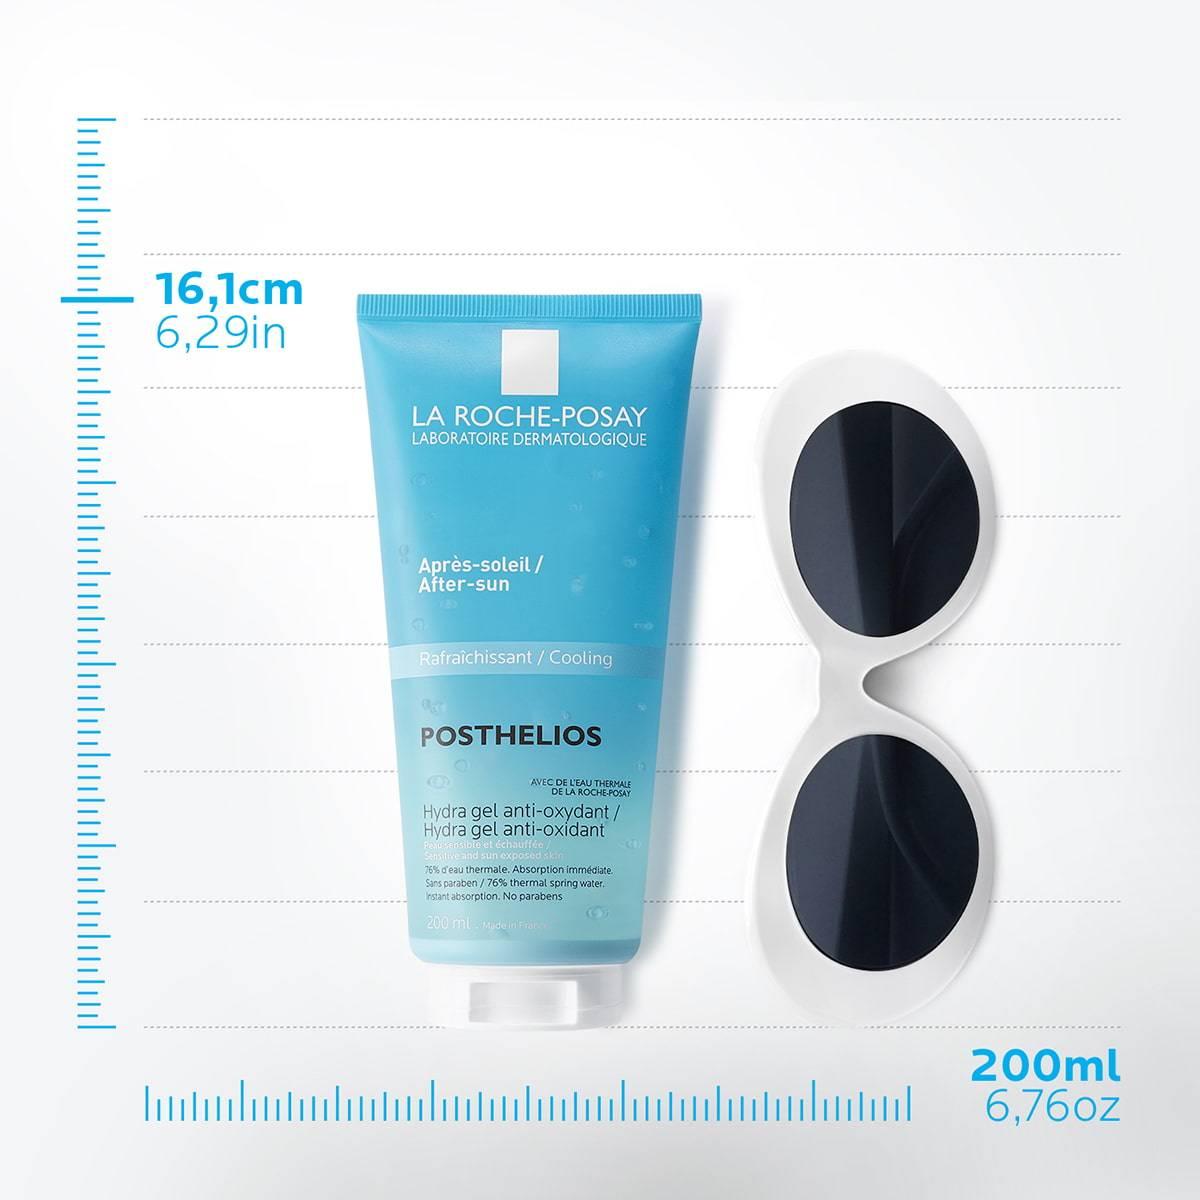 La Roche Posay Produktsida After sun Posthelios Hydragel 200ml 3337875